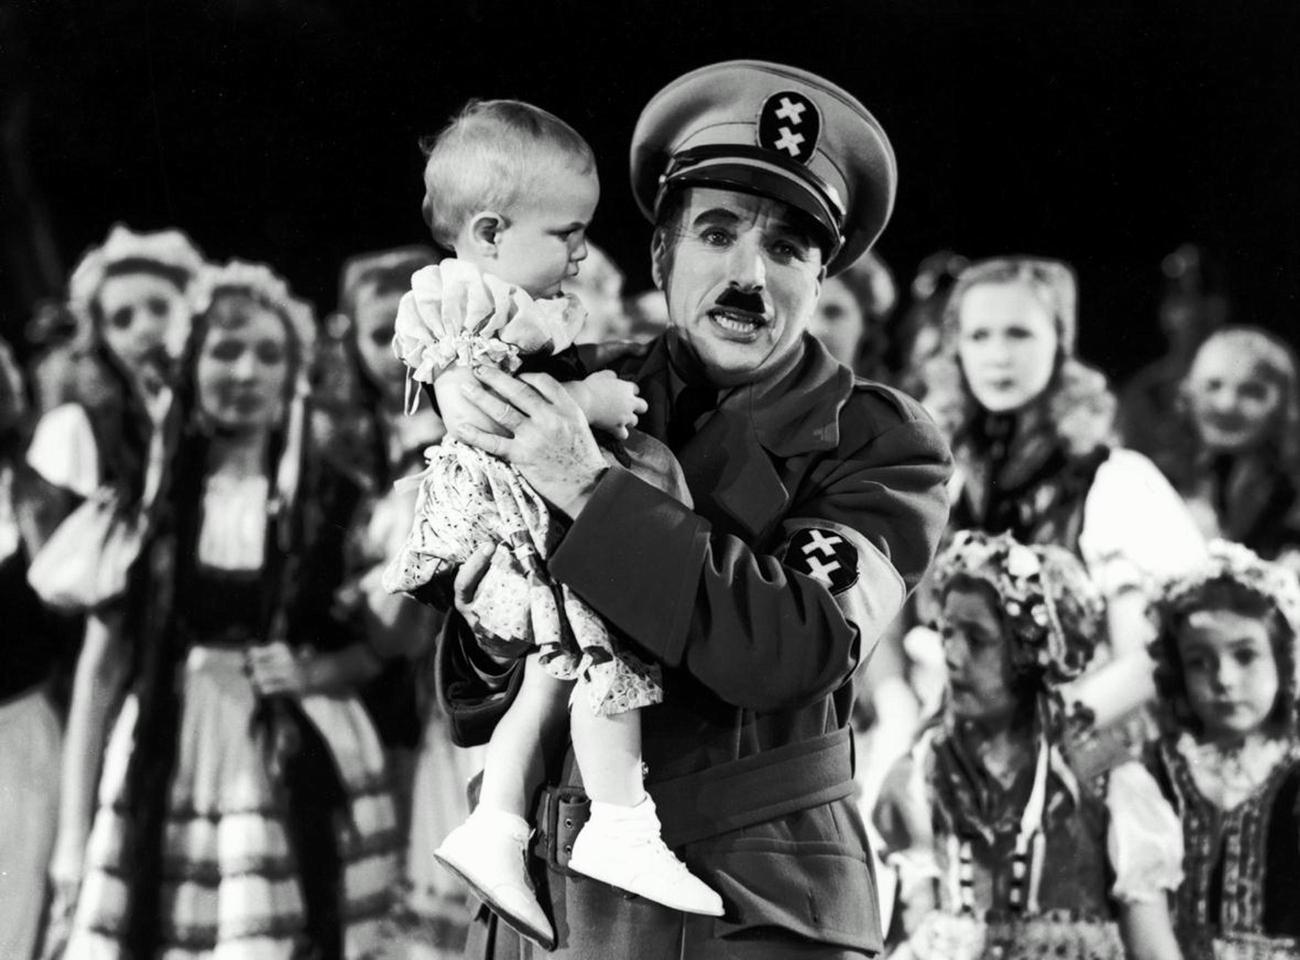 groe-diktator-der-charles-chaplin-9-rcm0x1920u